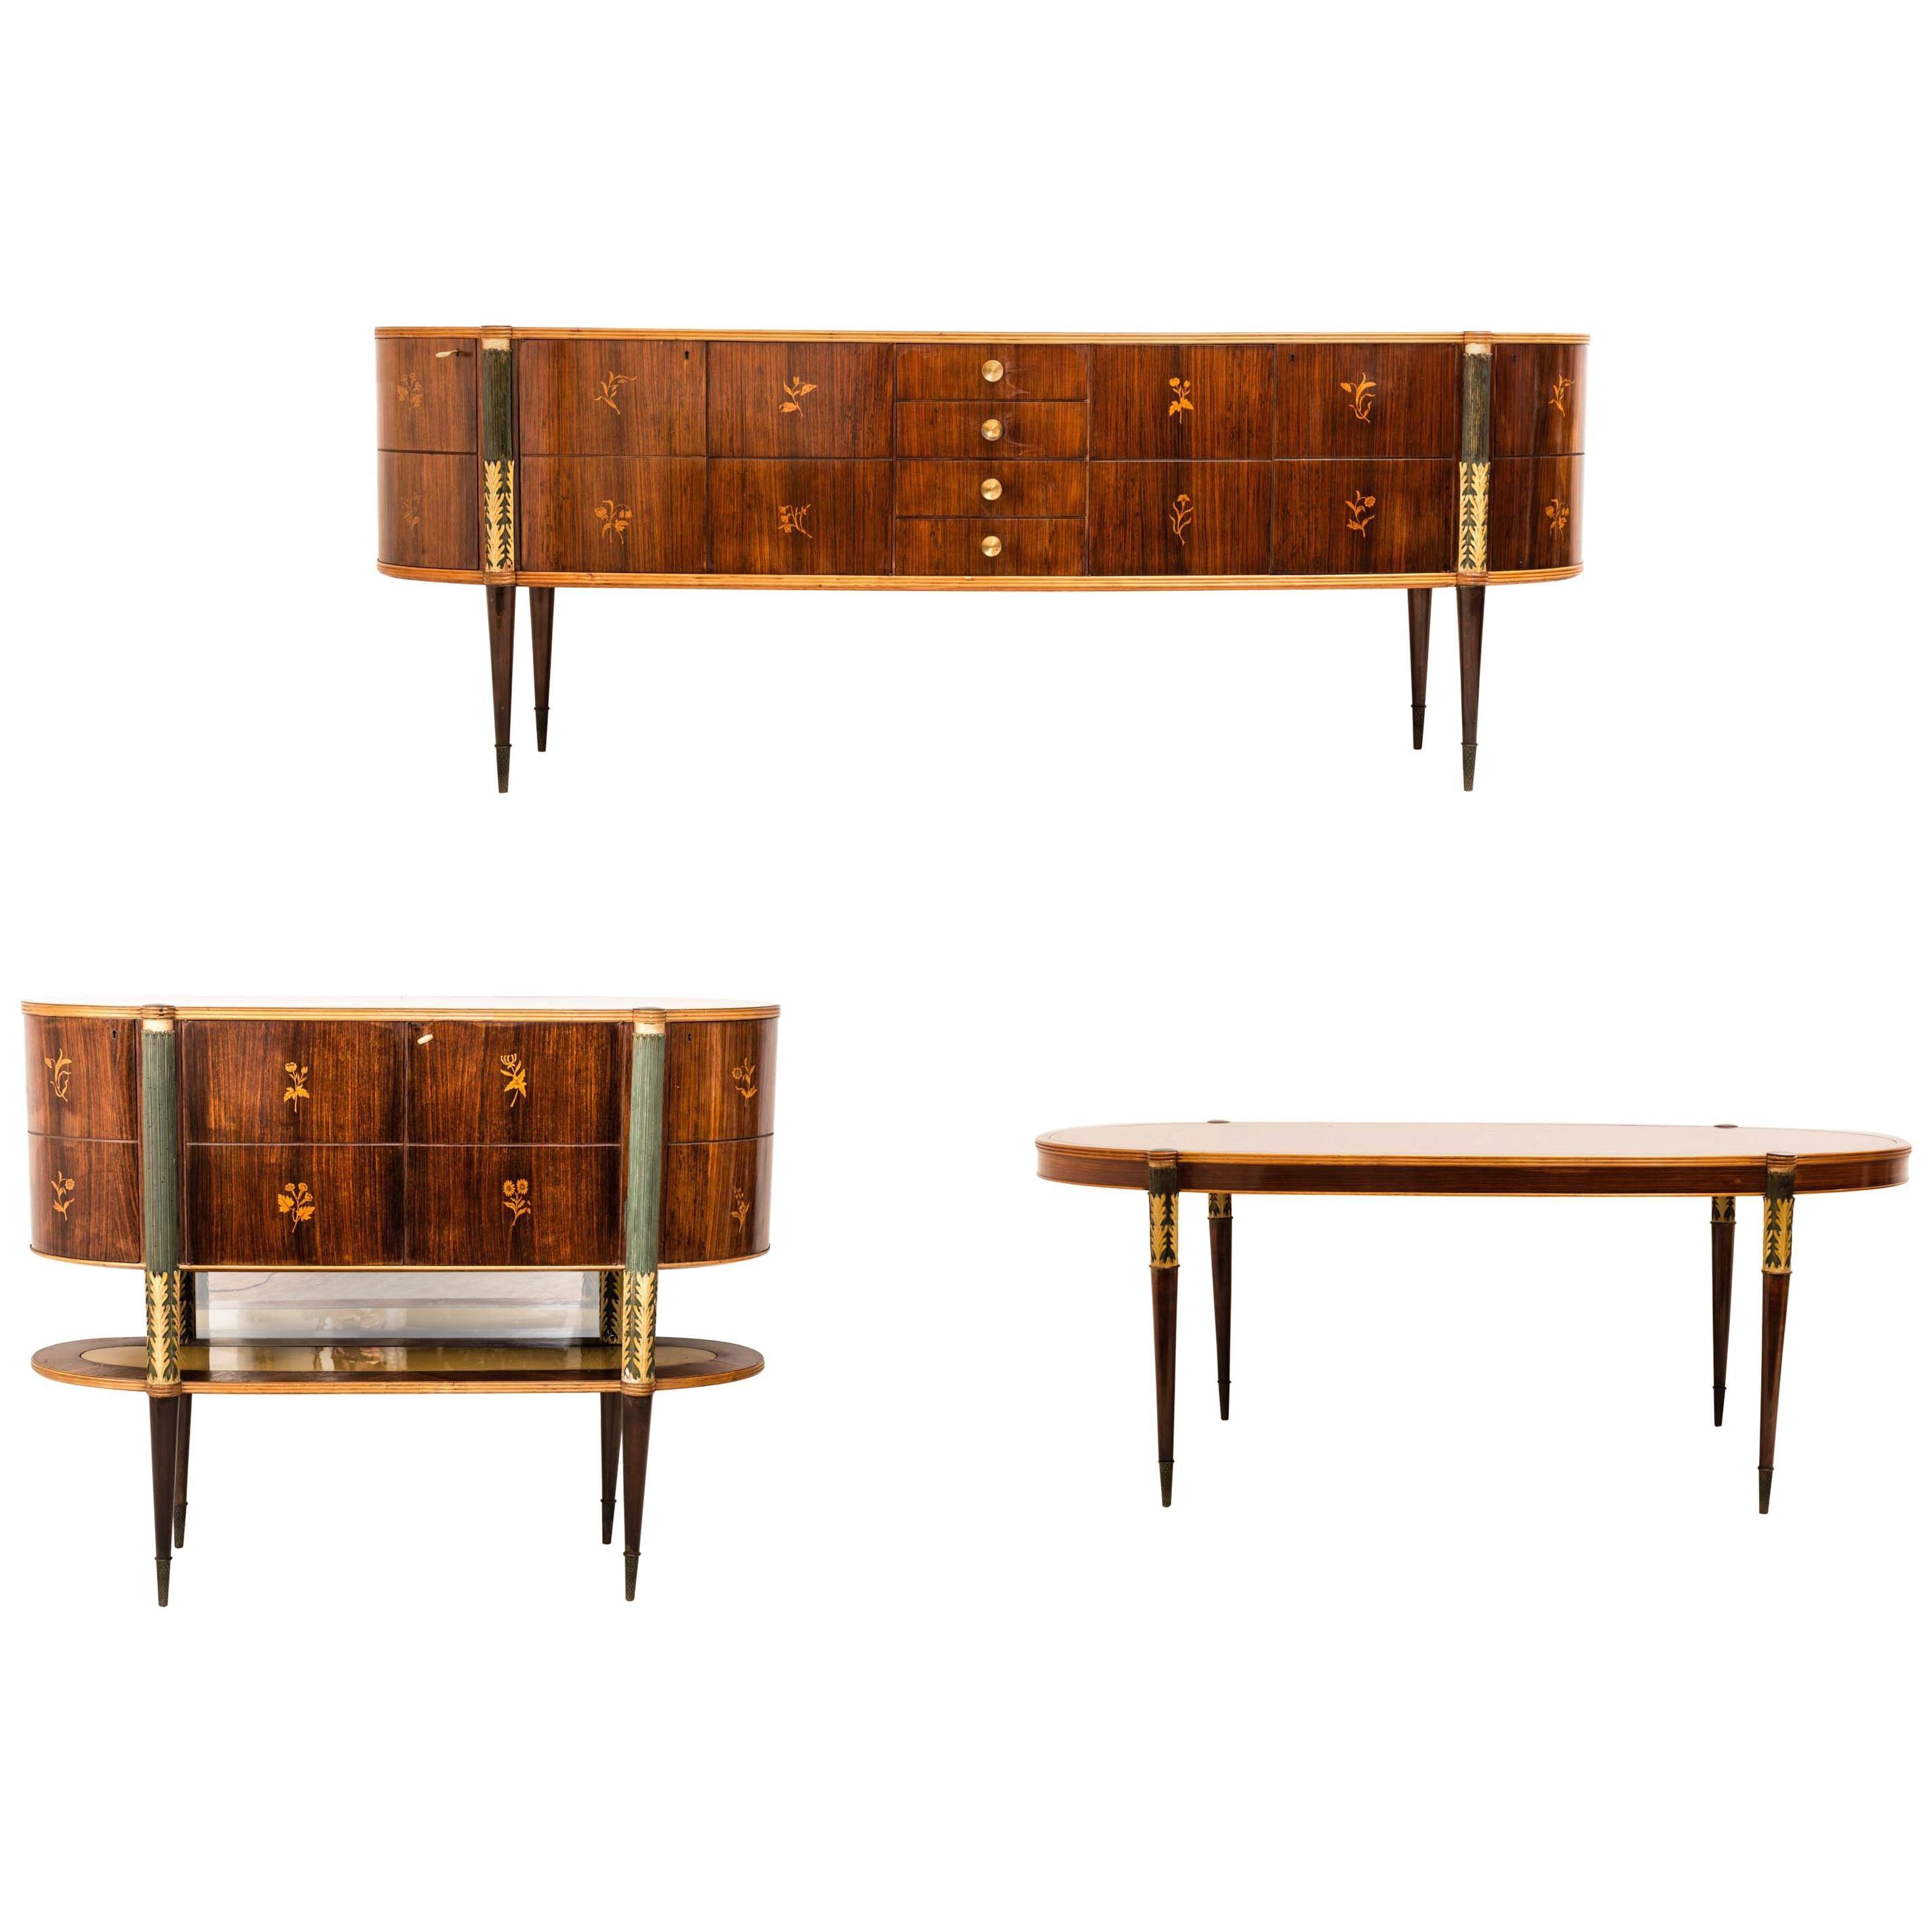 Pier Luigi Colli Midcentury Italian Dining Room Set- Sideboard Table Bar Cabinet